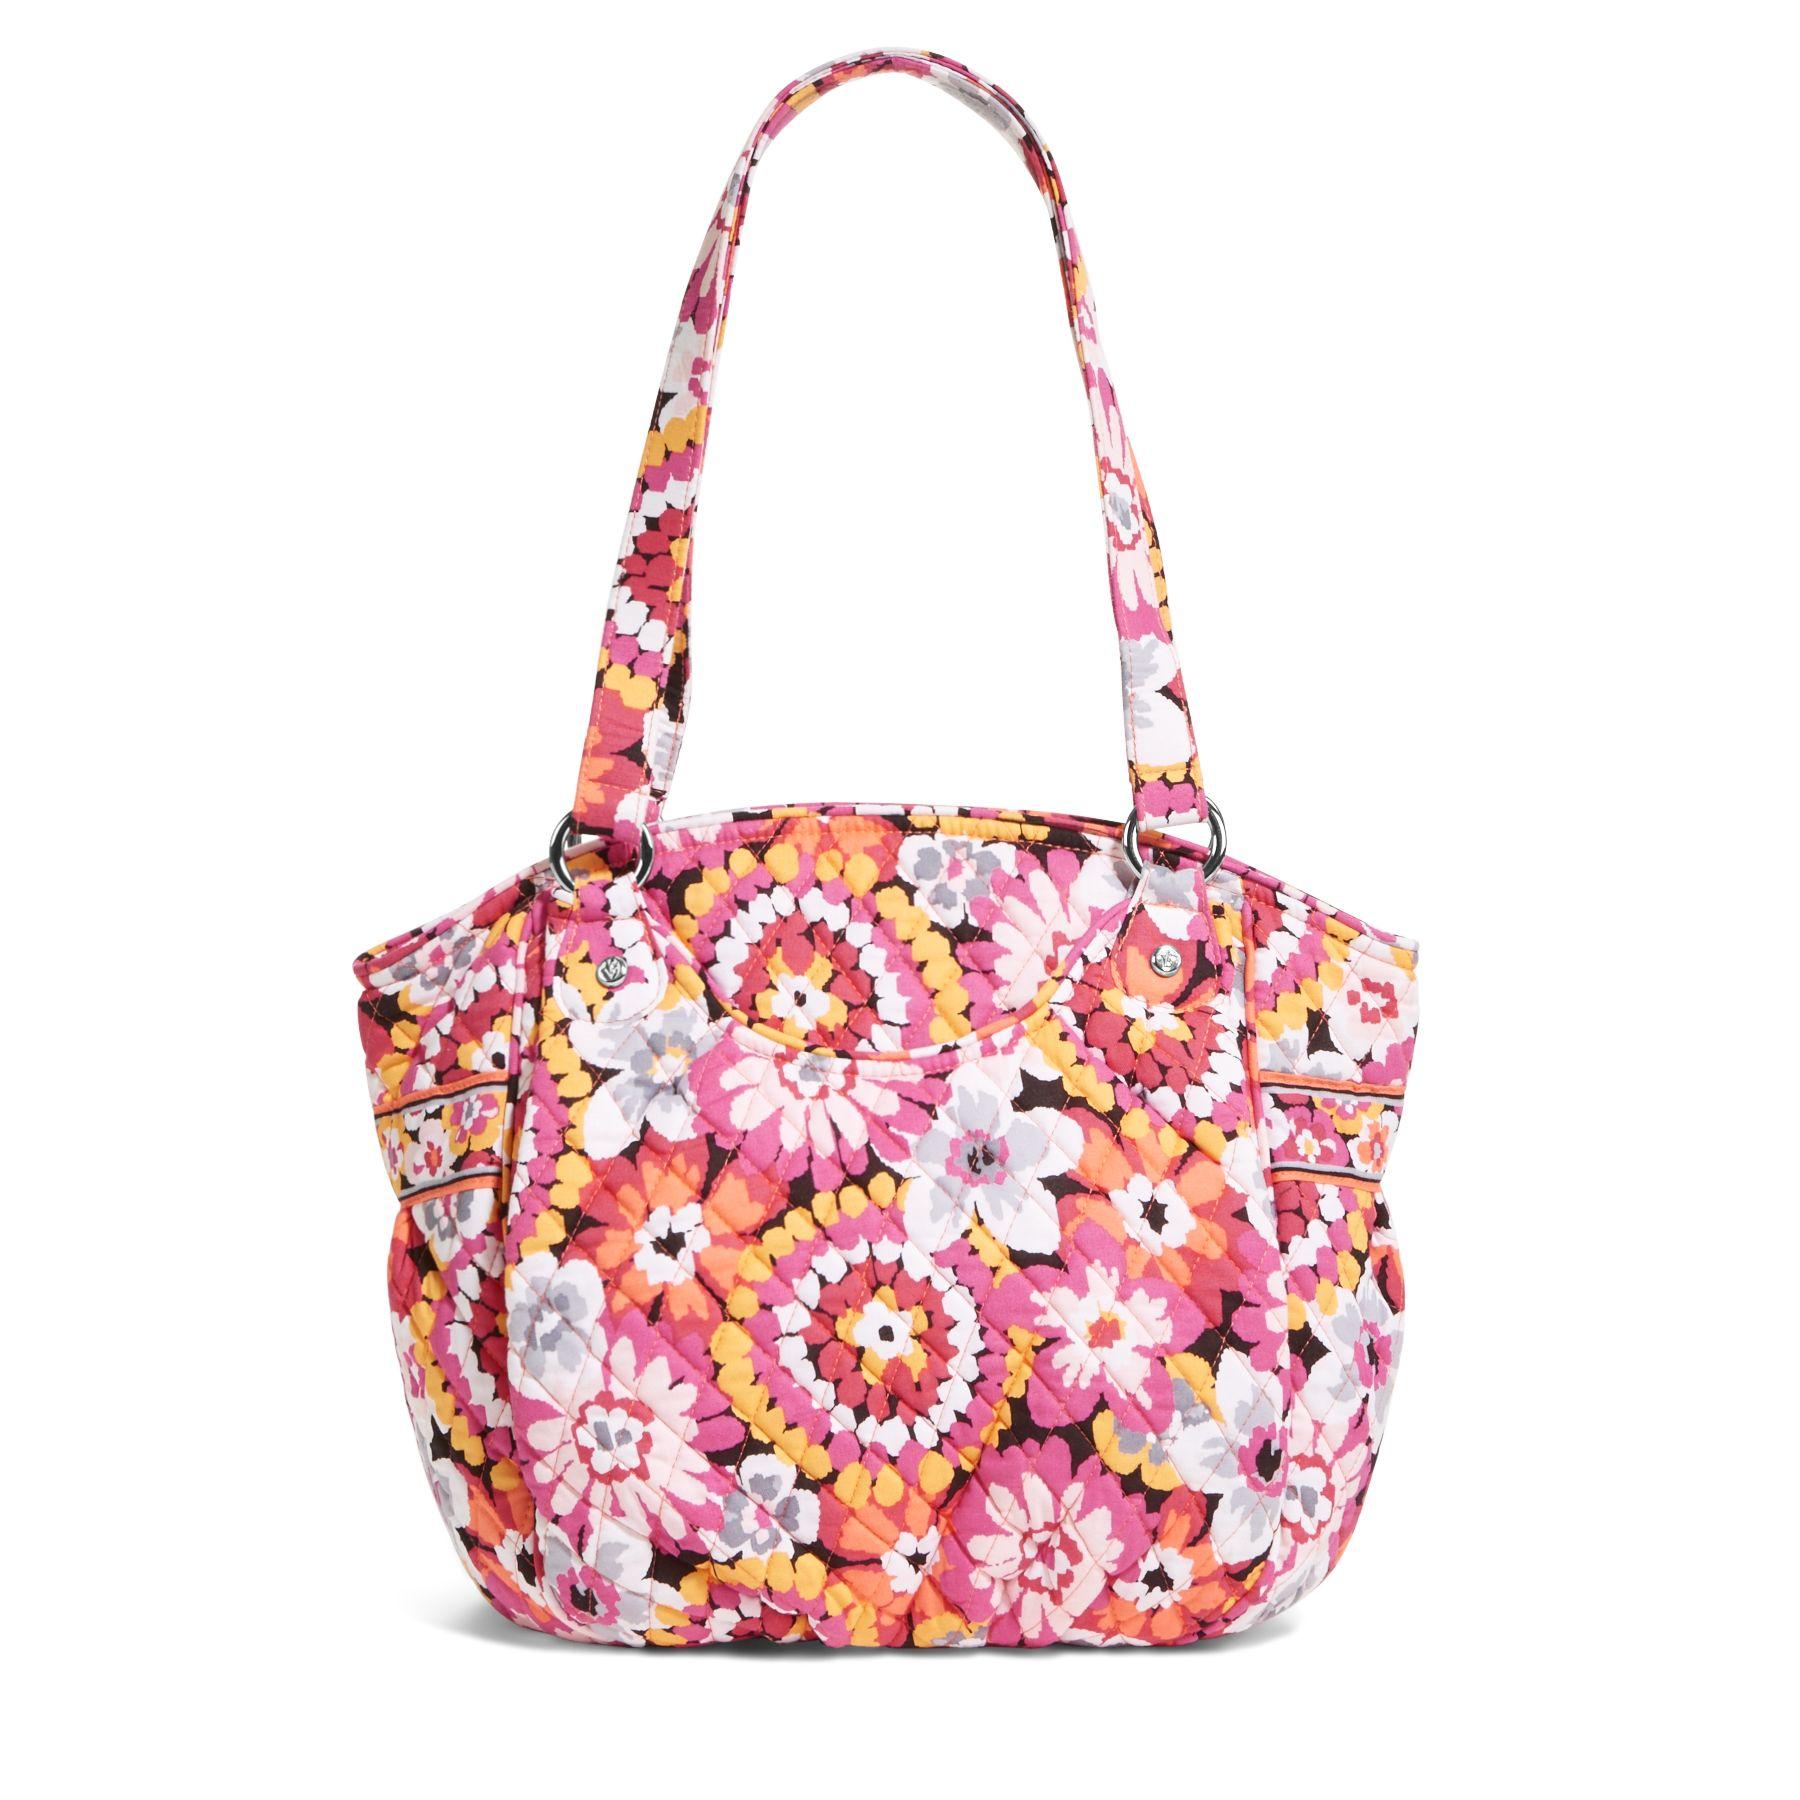 Vera Bradley Glenna Shoulder Bag in Pixie Blooms